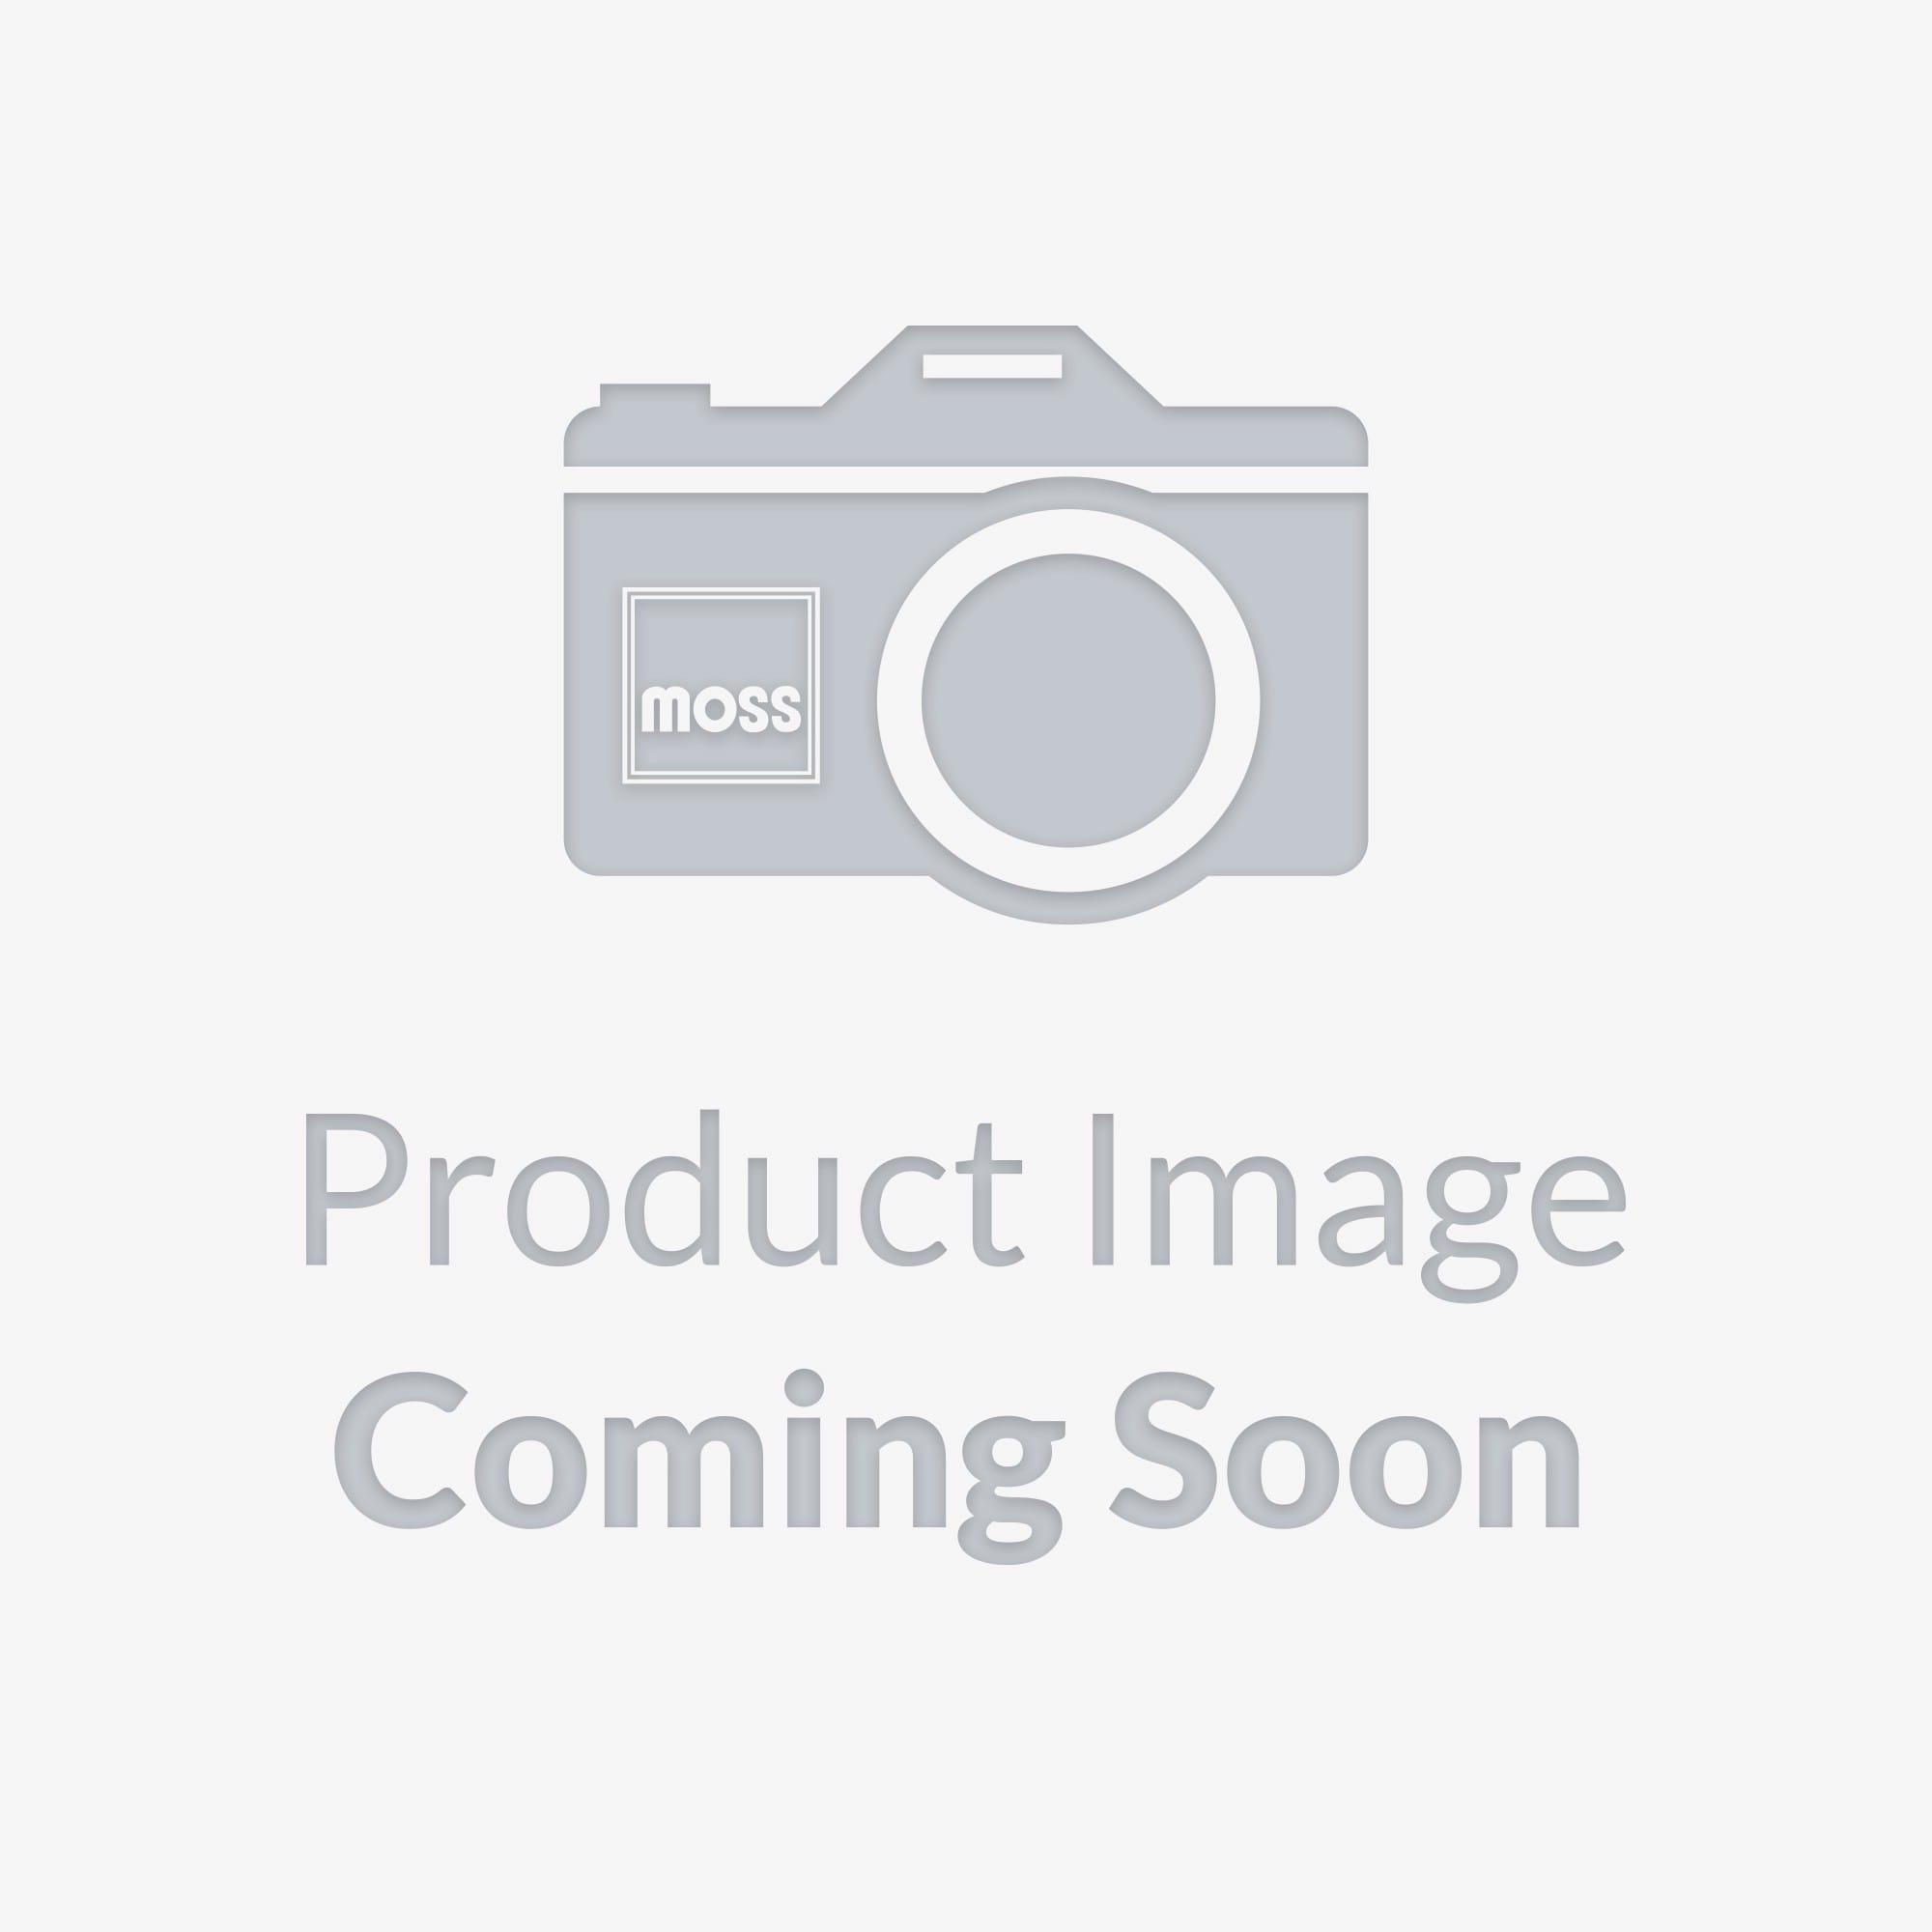 Upholstery & interior trim for your Triumph TR2, TR3, TR4